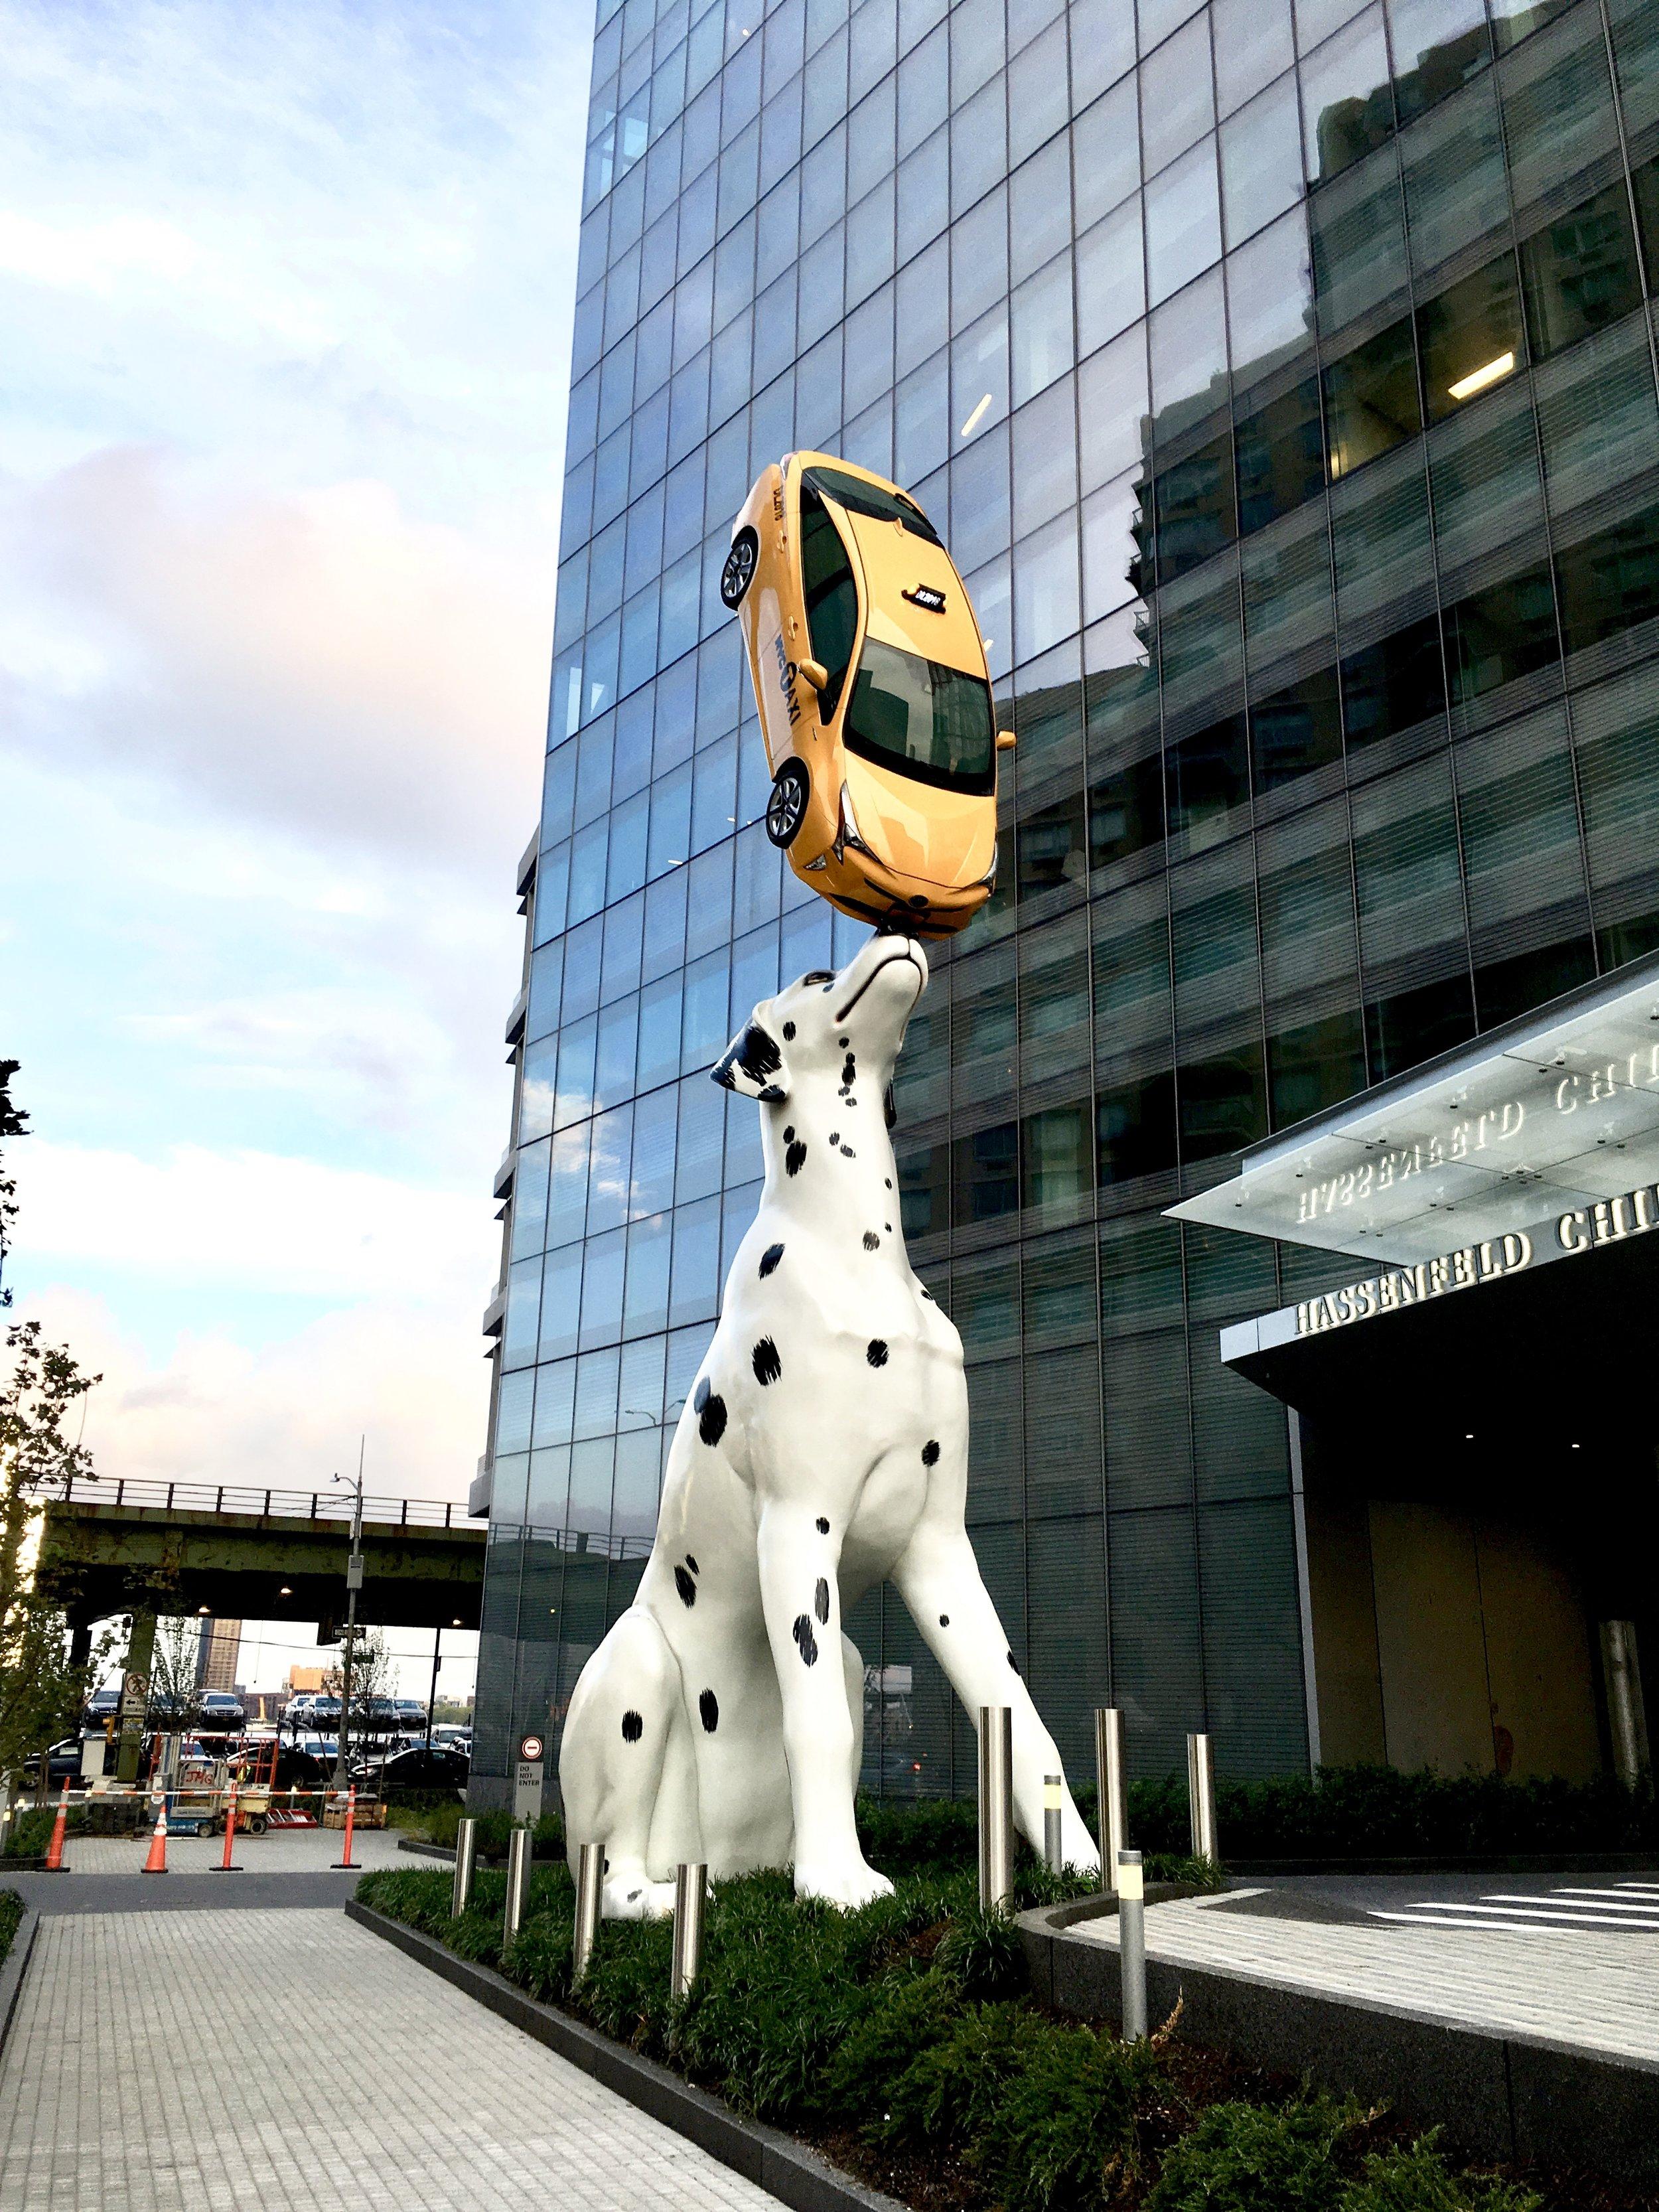 SPOT Dalmatian Dog Holding Taxi on Nose